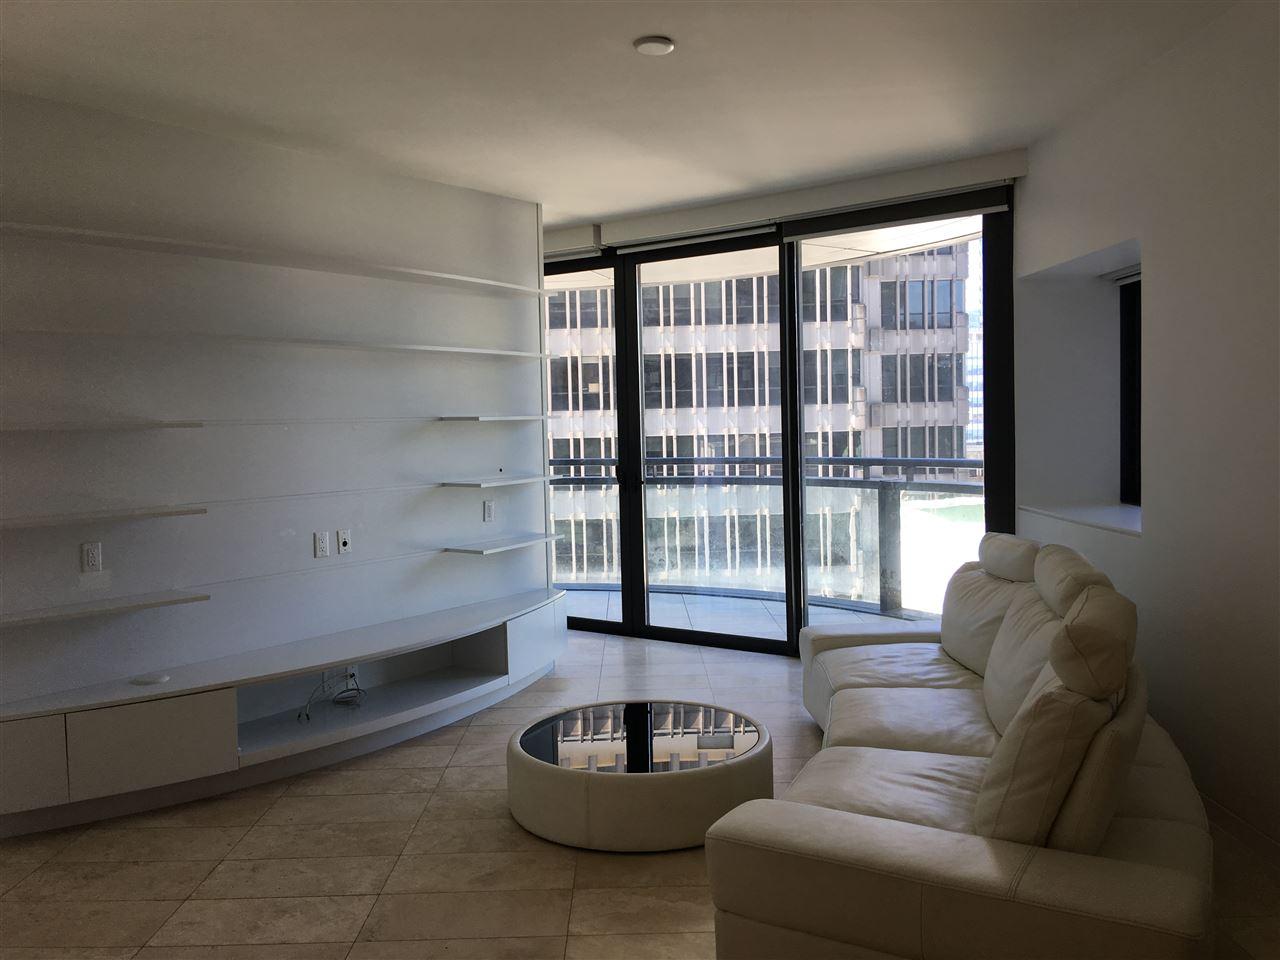 Condo Apartment at 1407 838 W HASTINGS STREET, Unit 1407, Vancouver West, British Columbia. Image 12